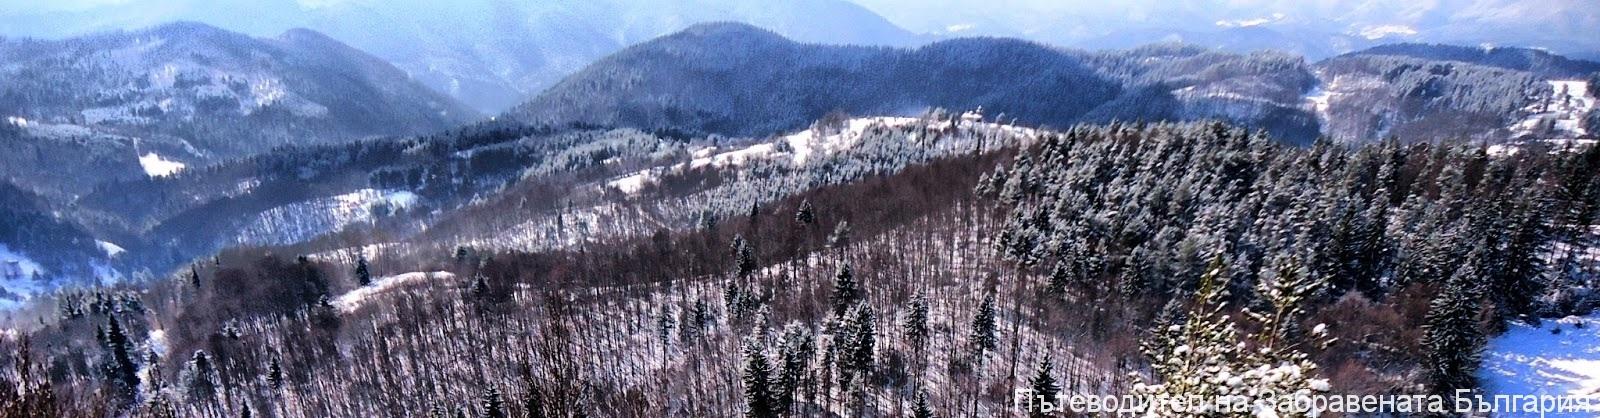 "Фотоконкурс ""Зимни приключения в България 2019"""